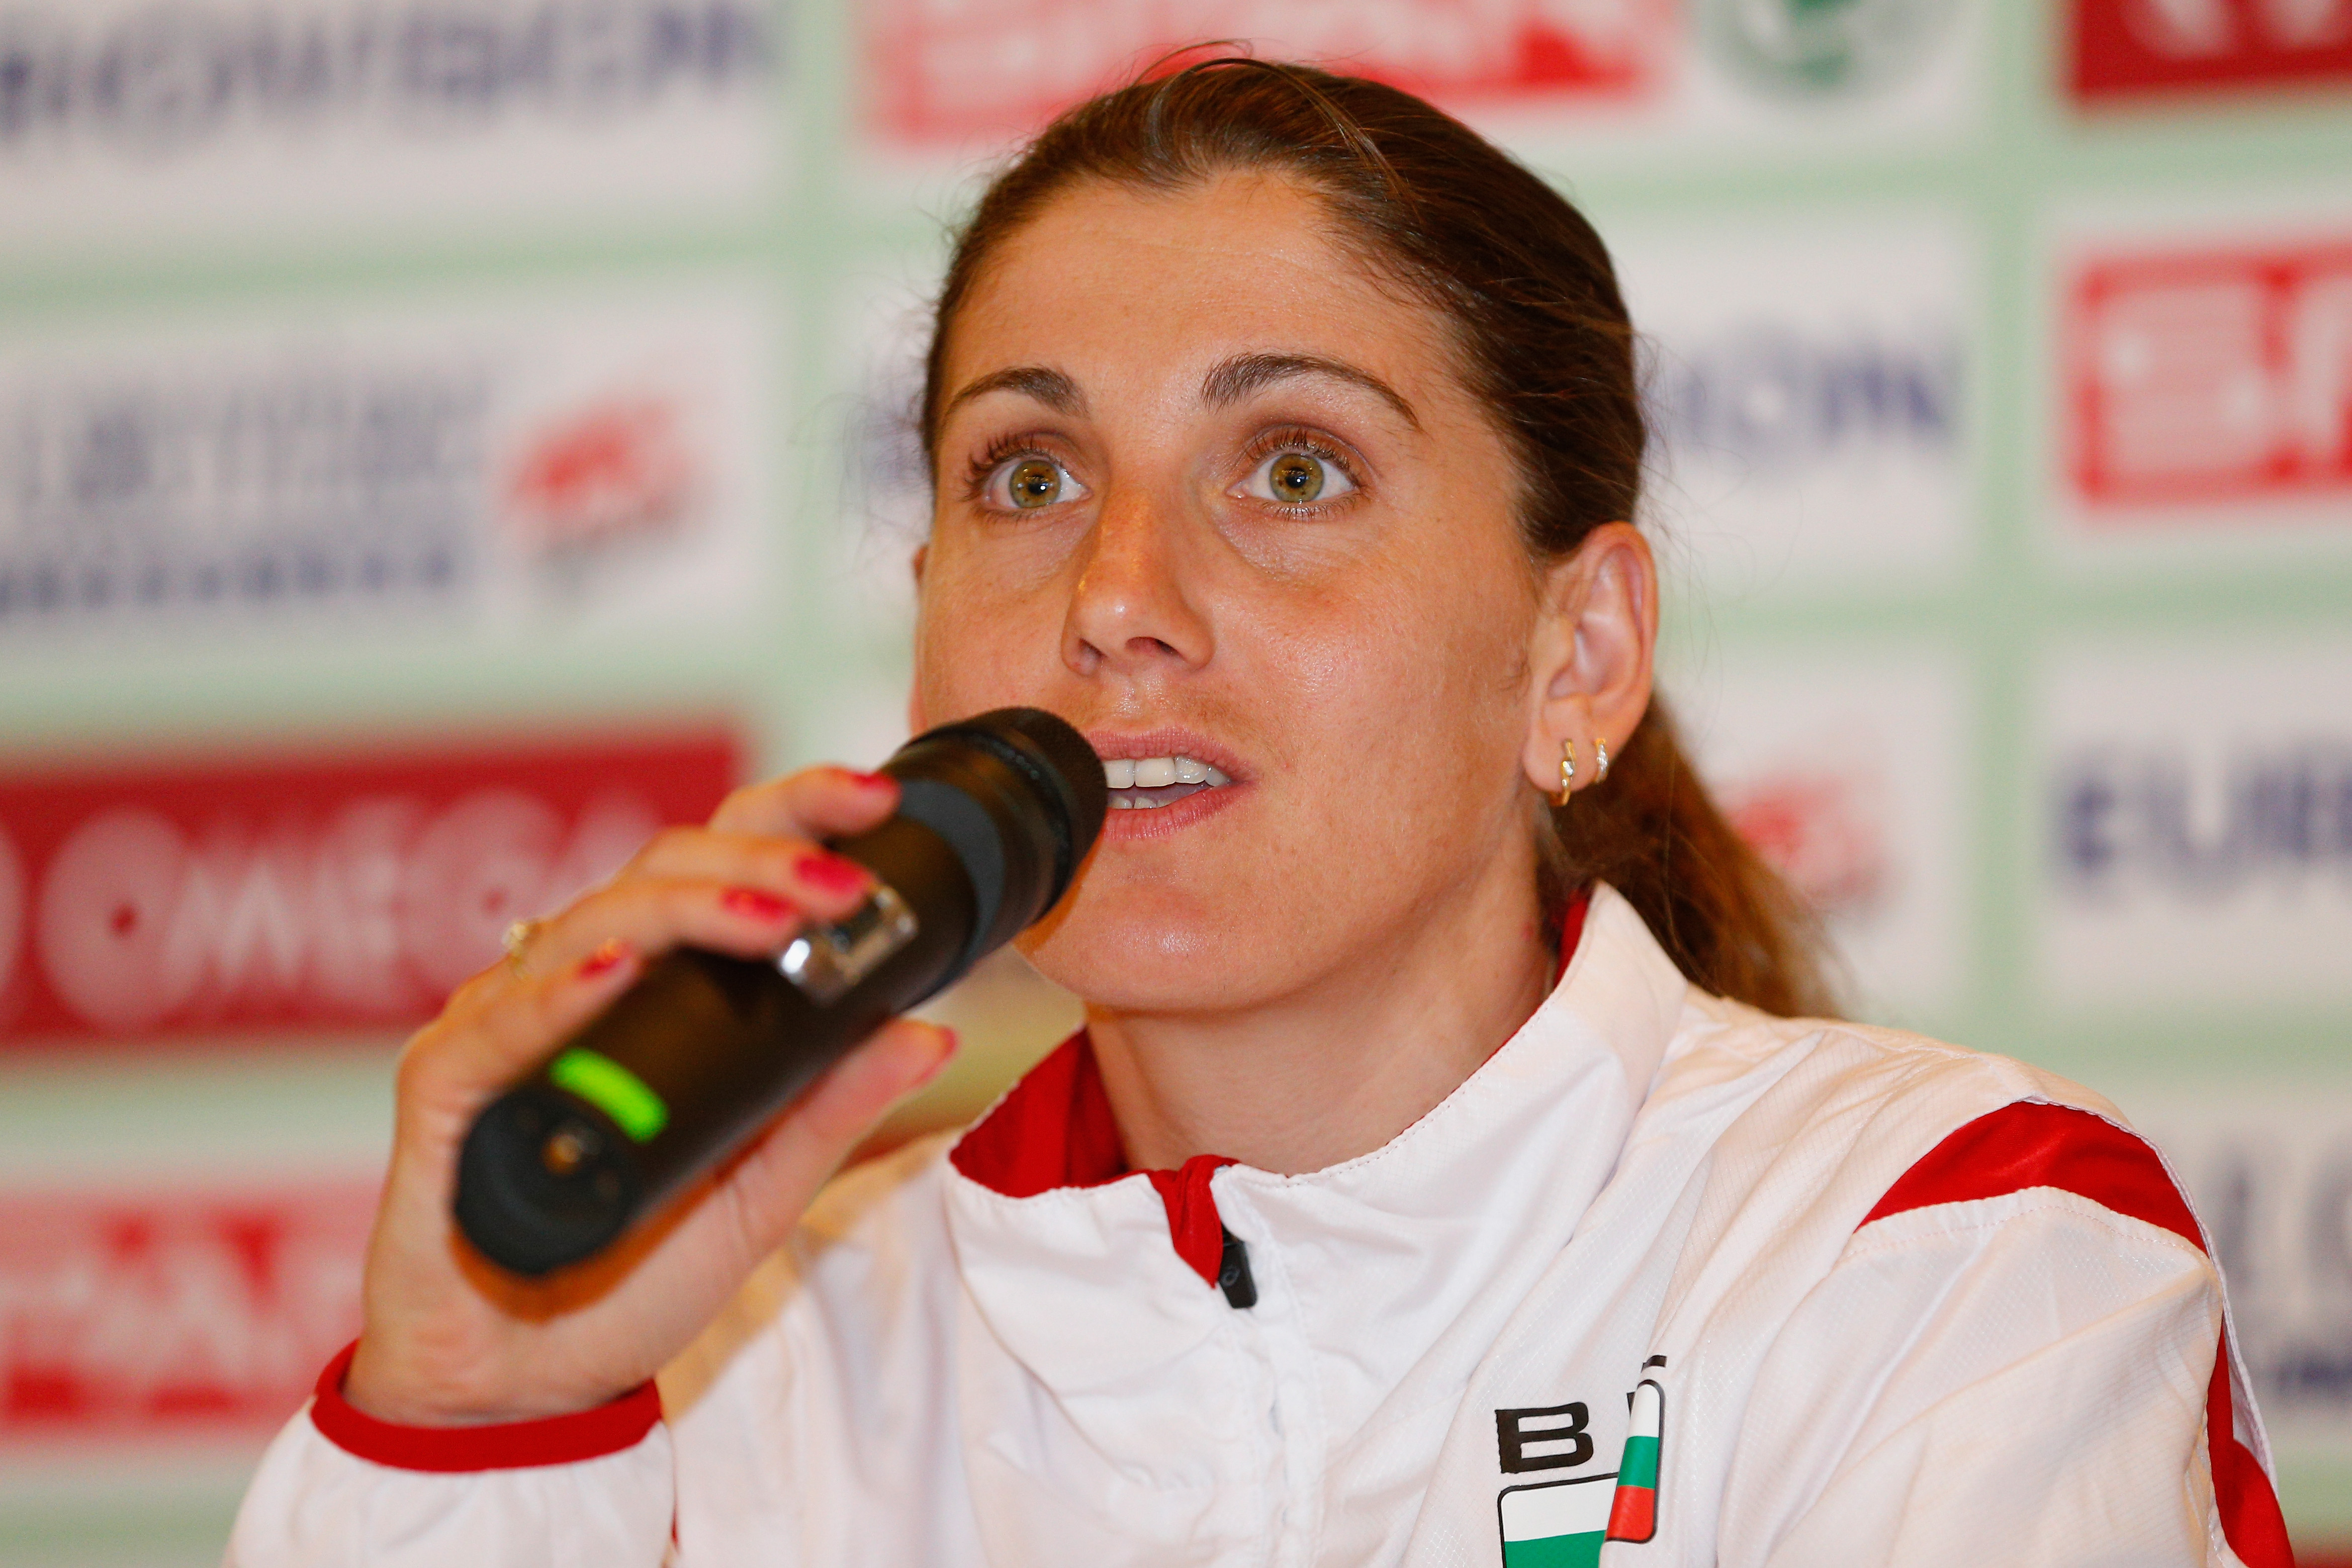 Bulgaria's Silvia Danekova tests positive for performance-enhancing drug at Rio Olympics